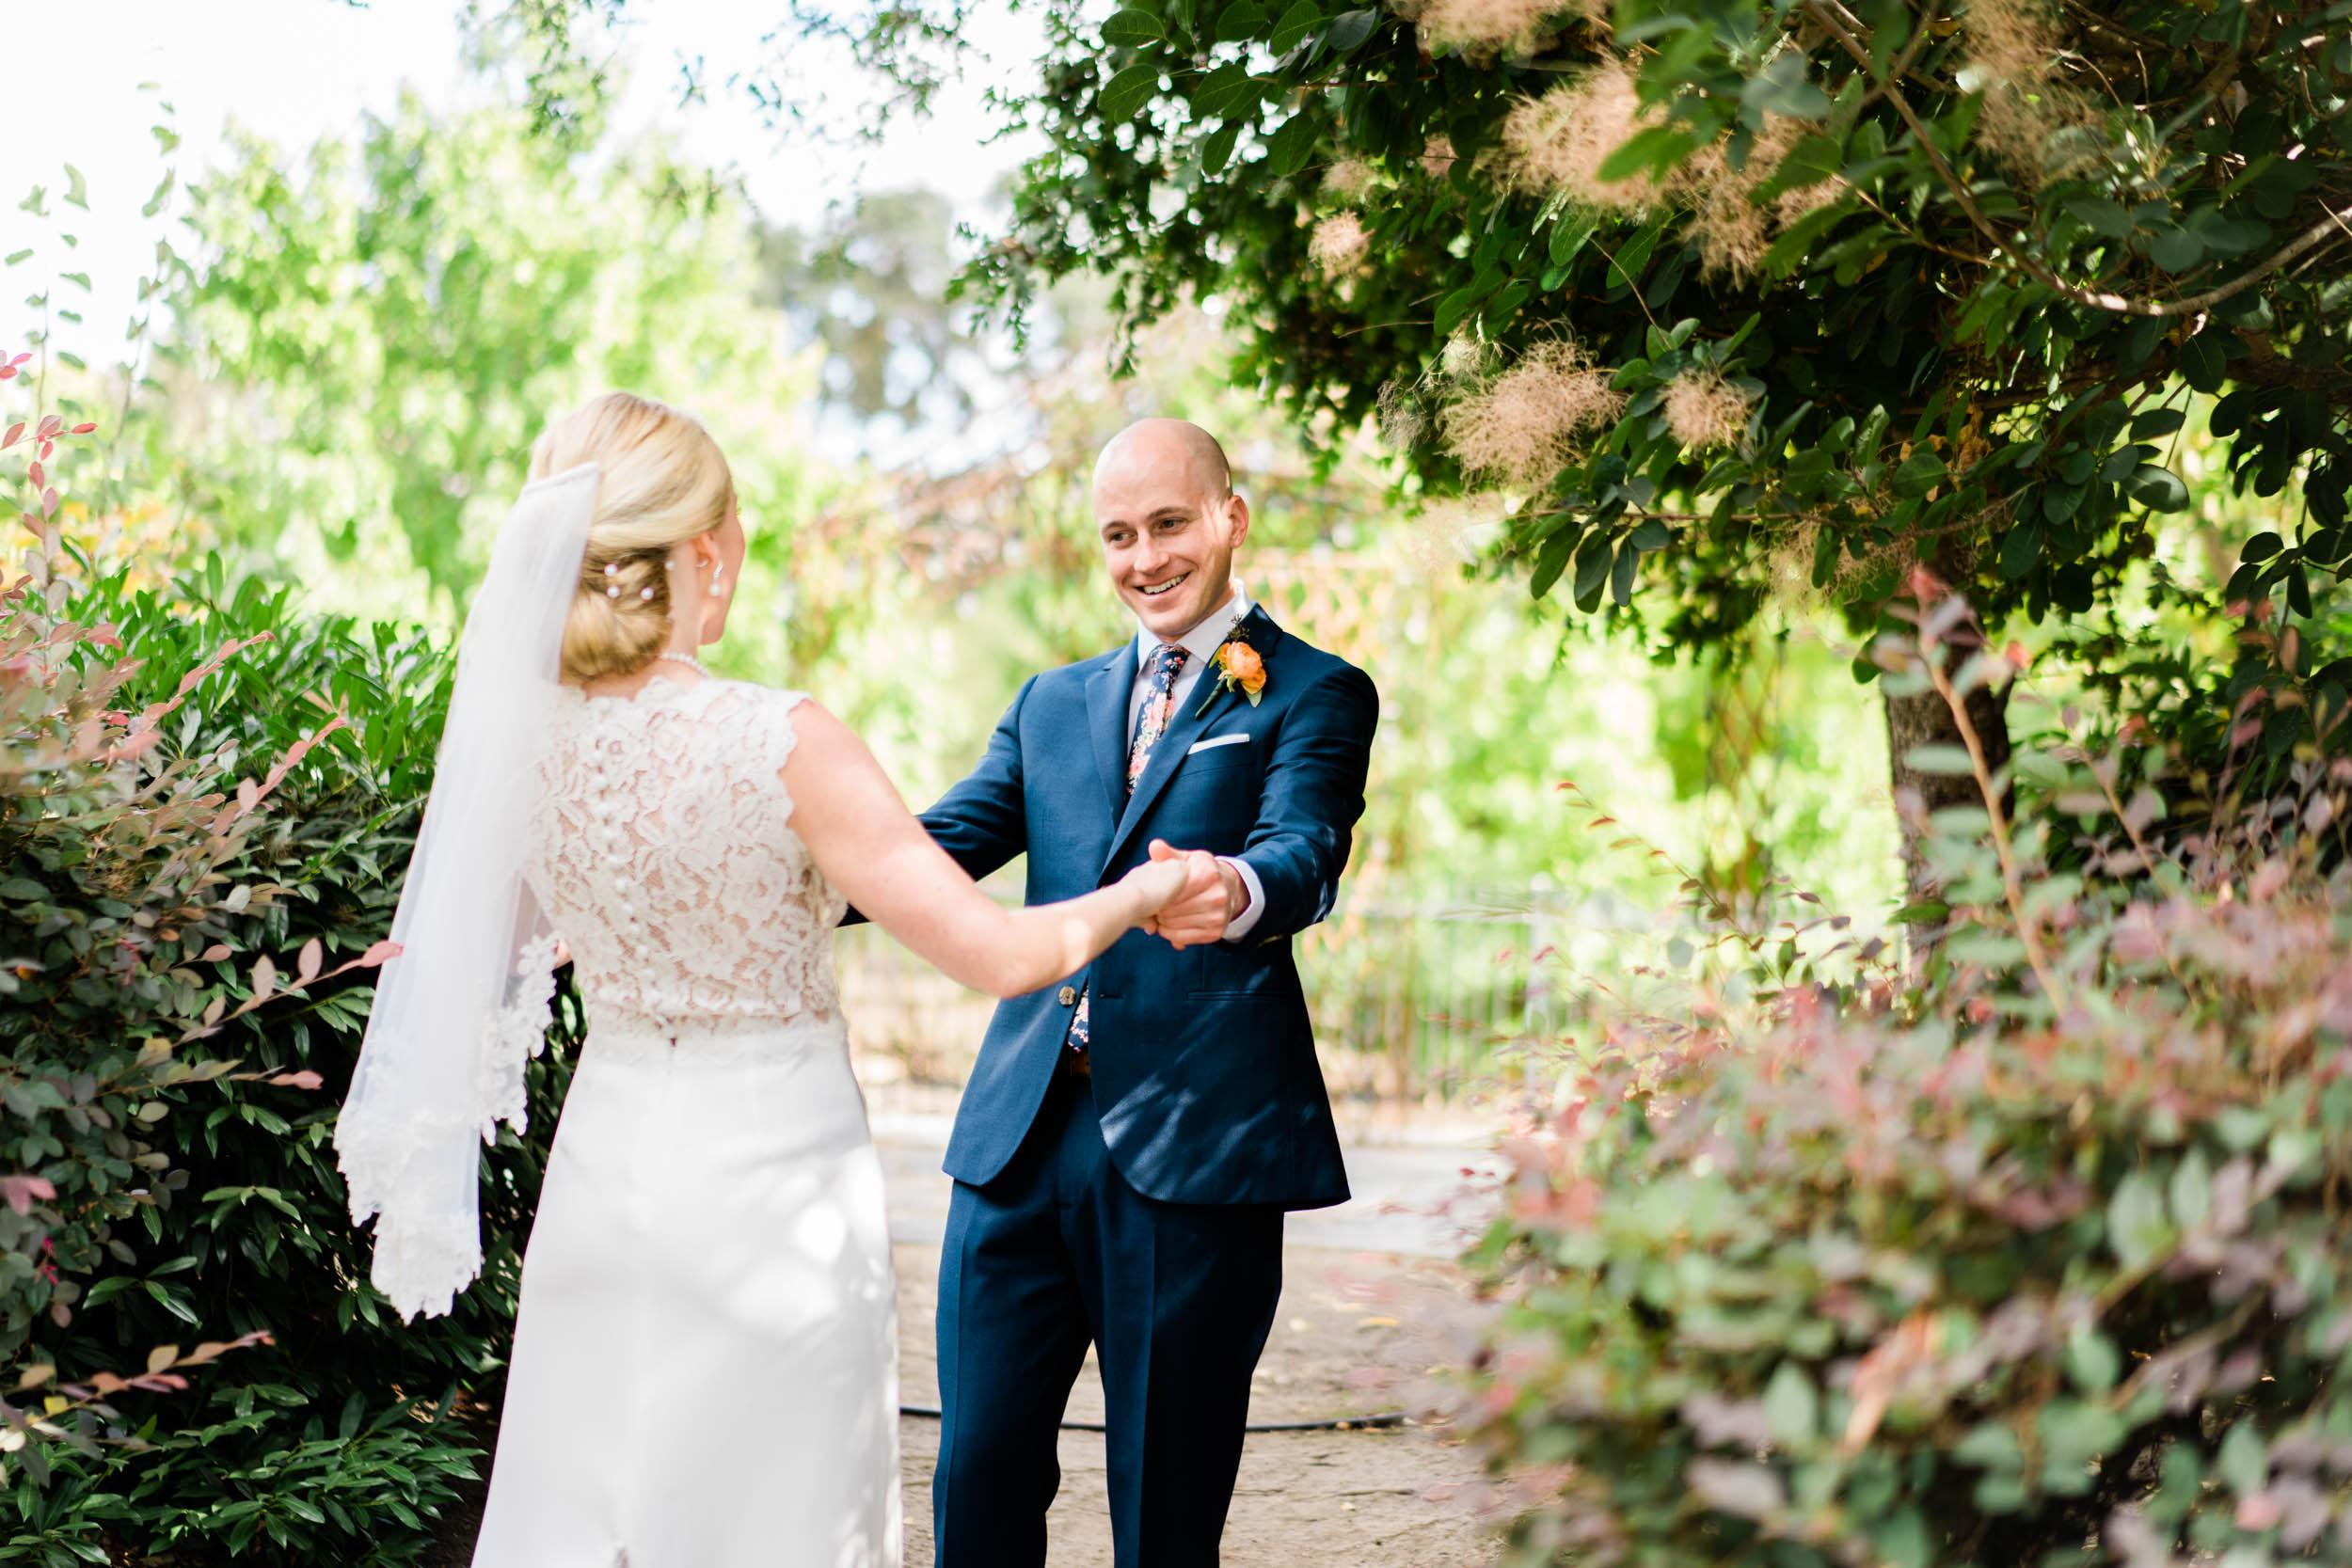 Elk Grove White Arbor Wedding Photographer -13.jpg